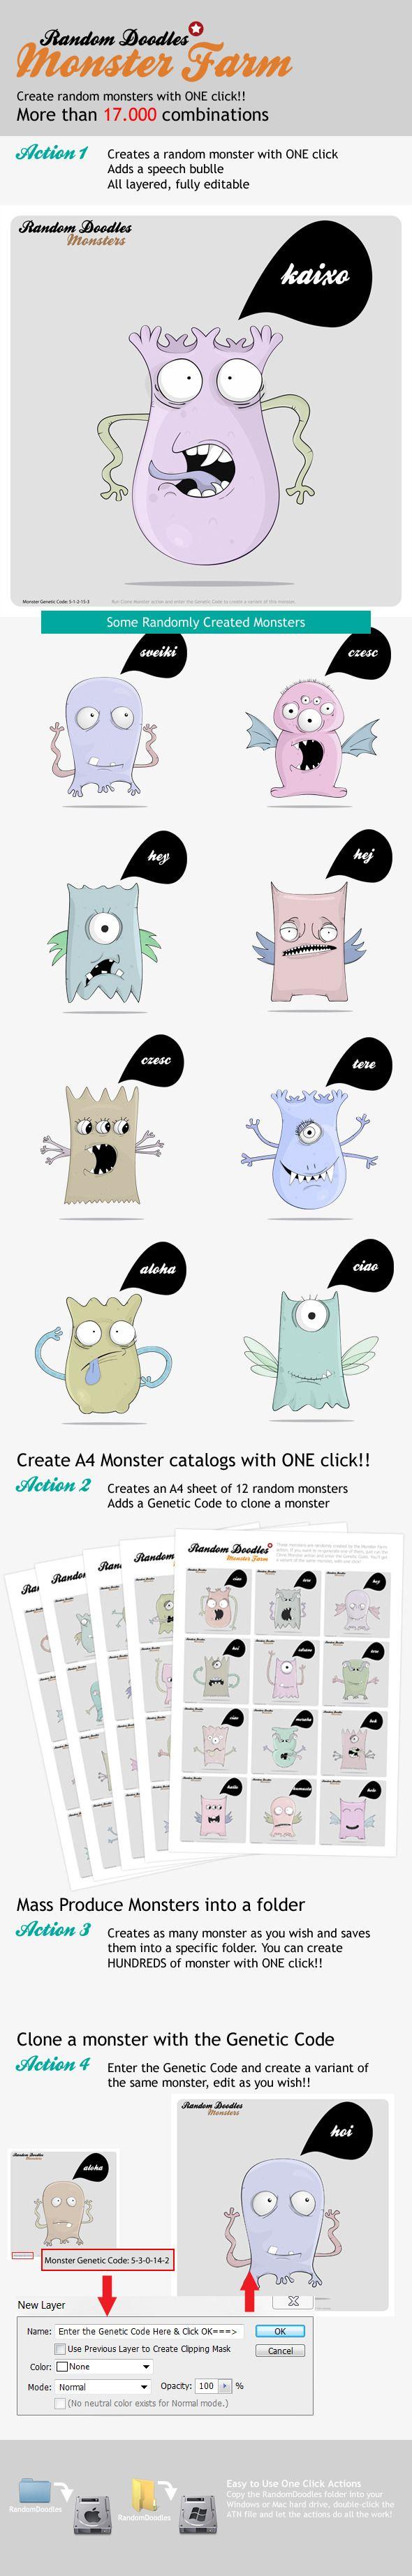 MonsterFarm Random Doodle Generator Doodles,